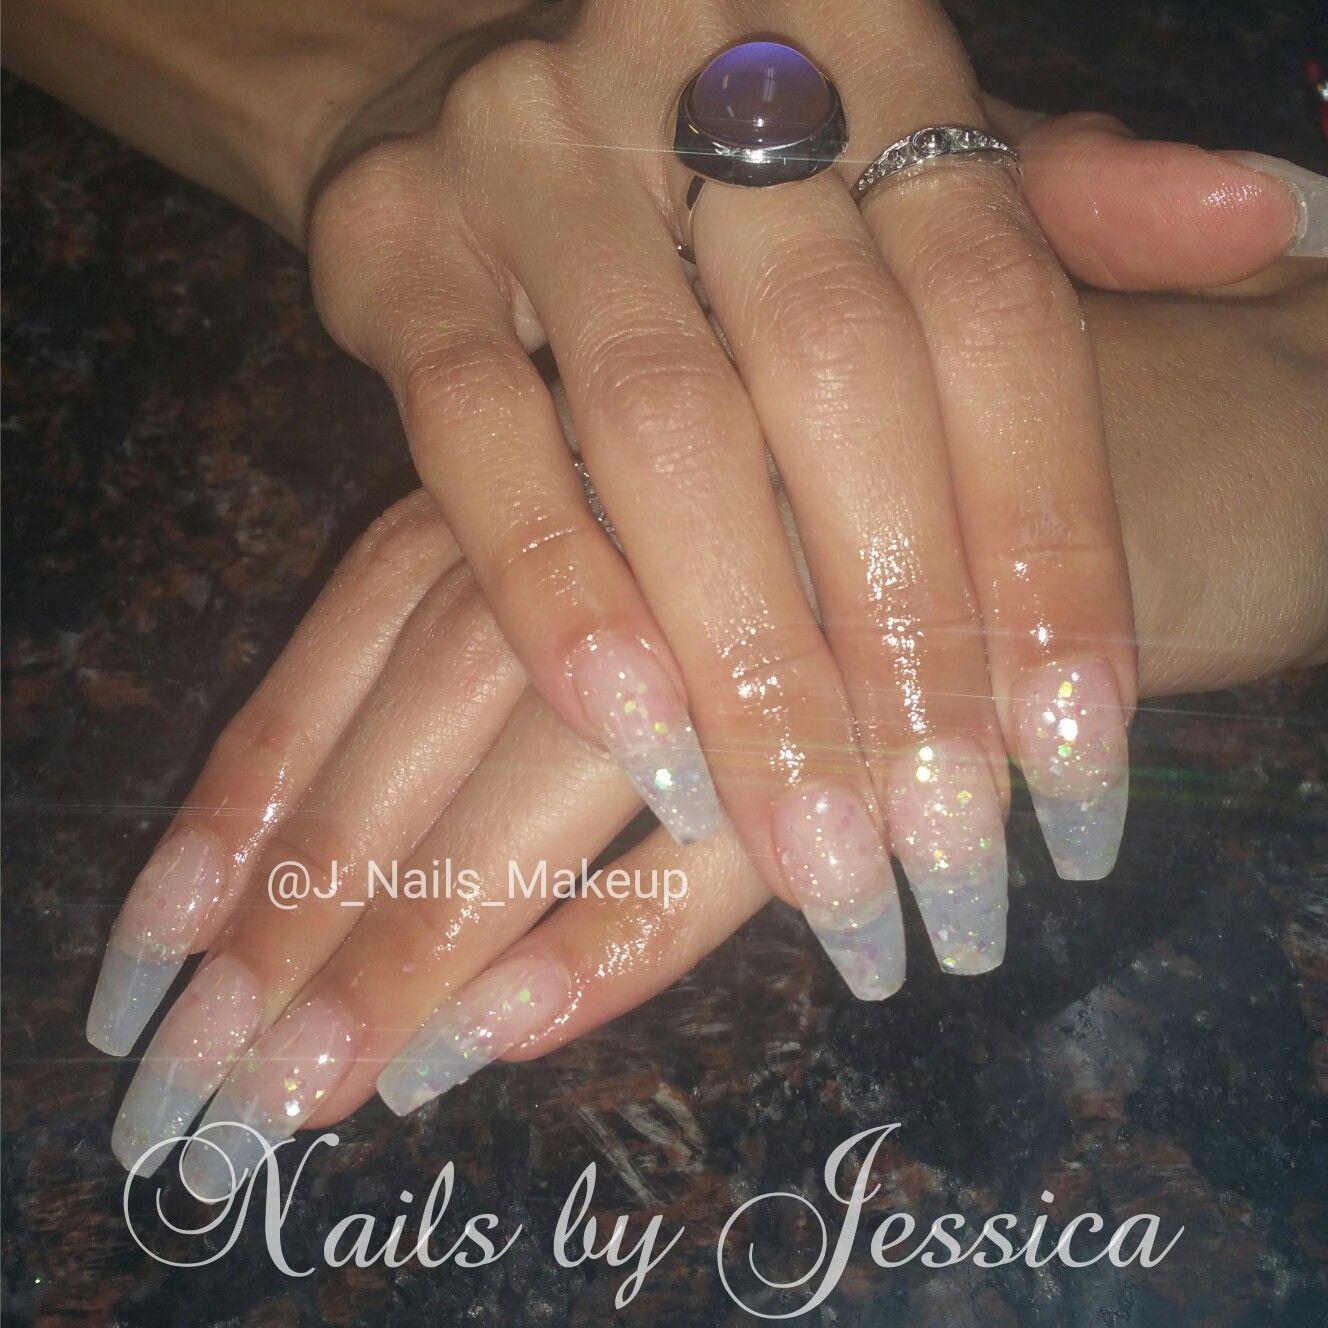 Fullset Of Coffin Encapsulated Acrylic Nails Glitter Mylar J Nails Makeup Nails Nails